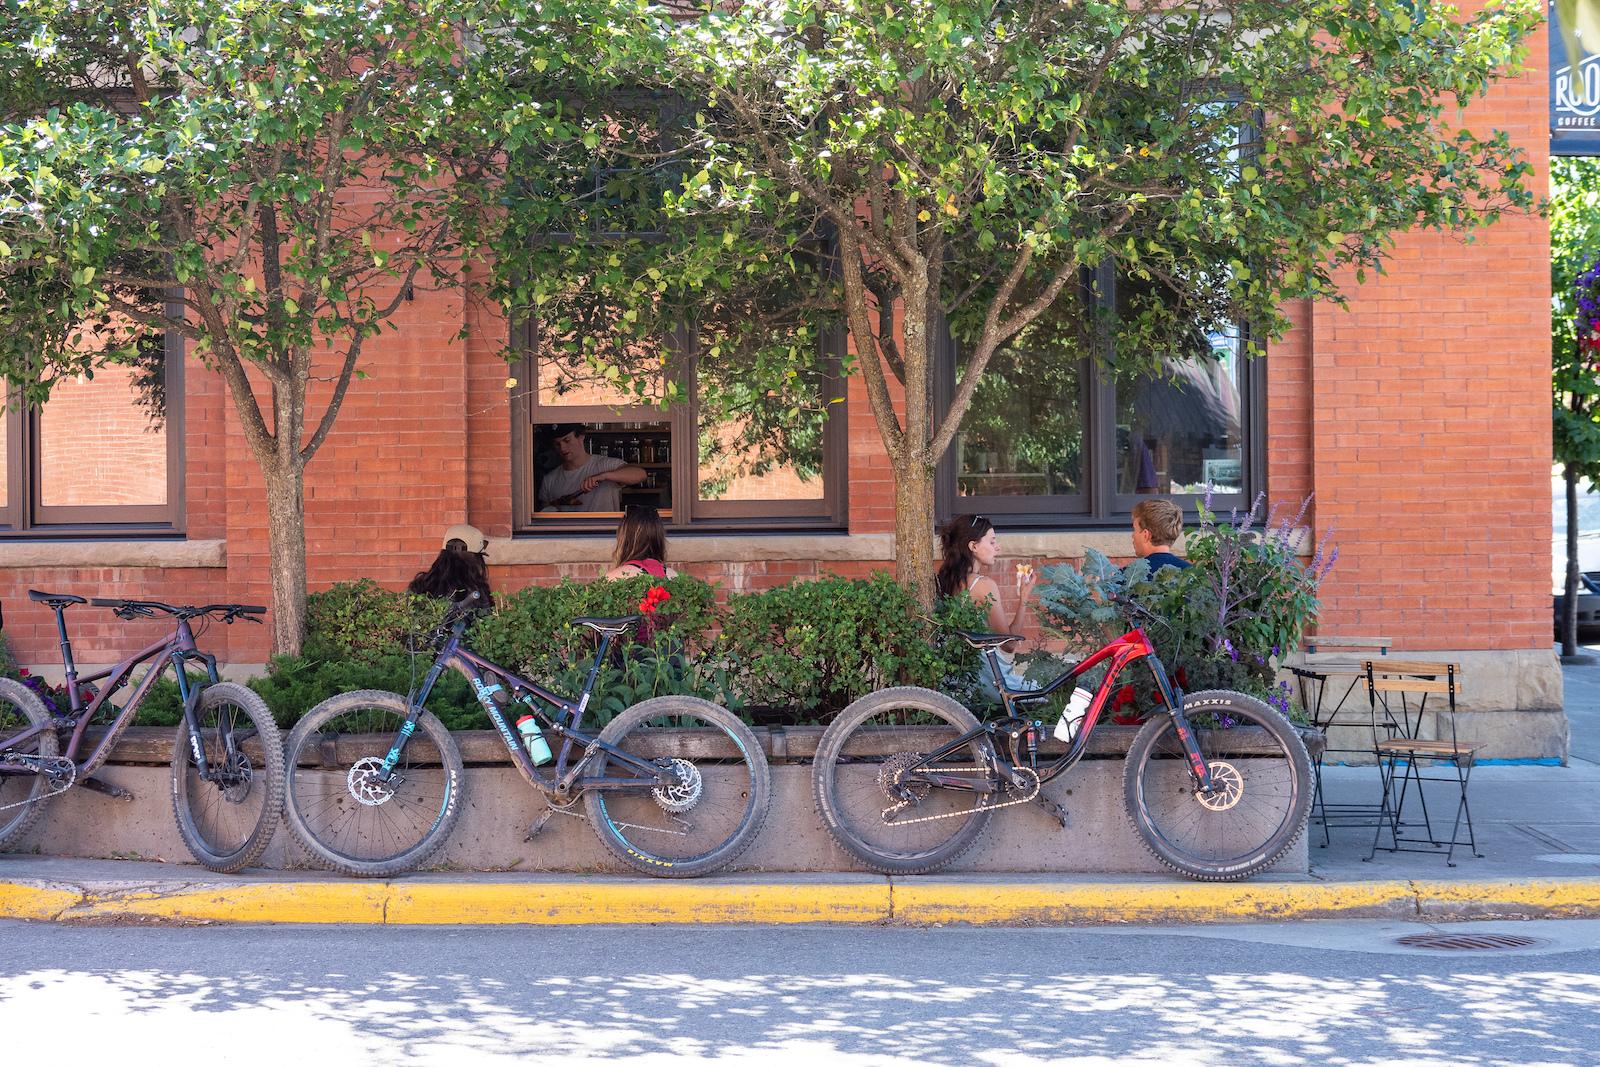 Bikes bikes everywhere